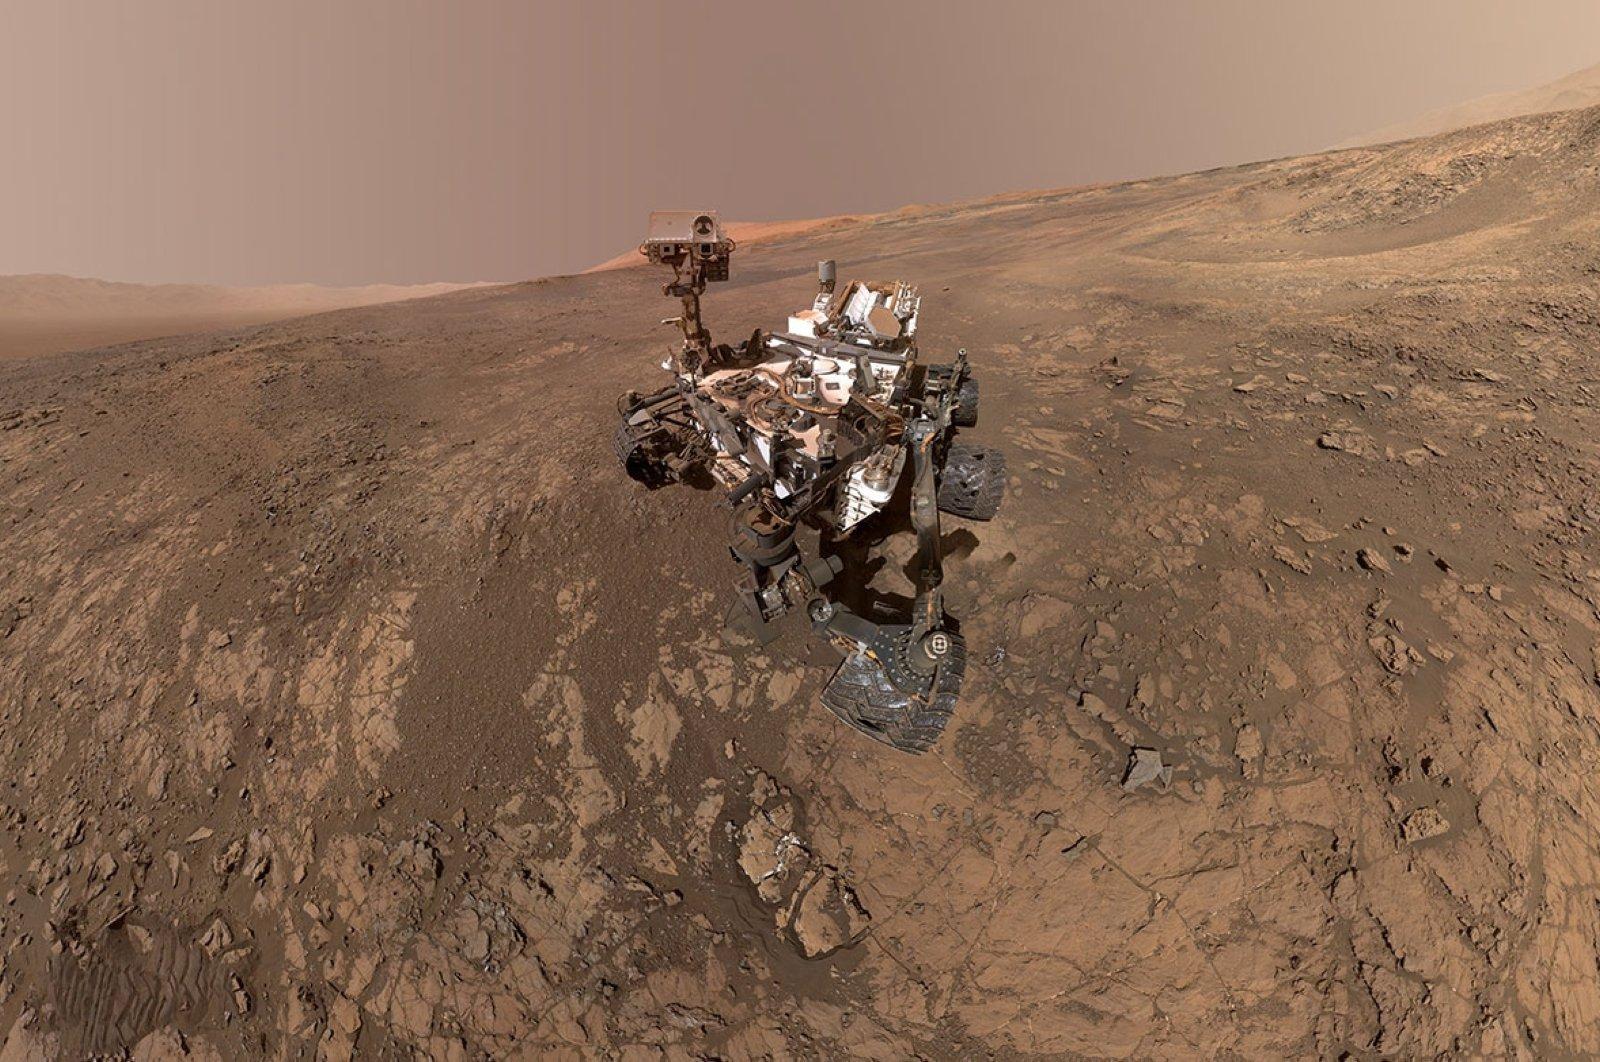 NASA's Curiosity Mars Rover snaps a self-portrait at a site called Vera Rubin Ridge on the Martian surface in February 2018. (Photo courtesy of NASA via Reuters)